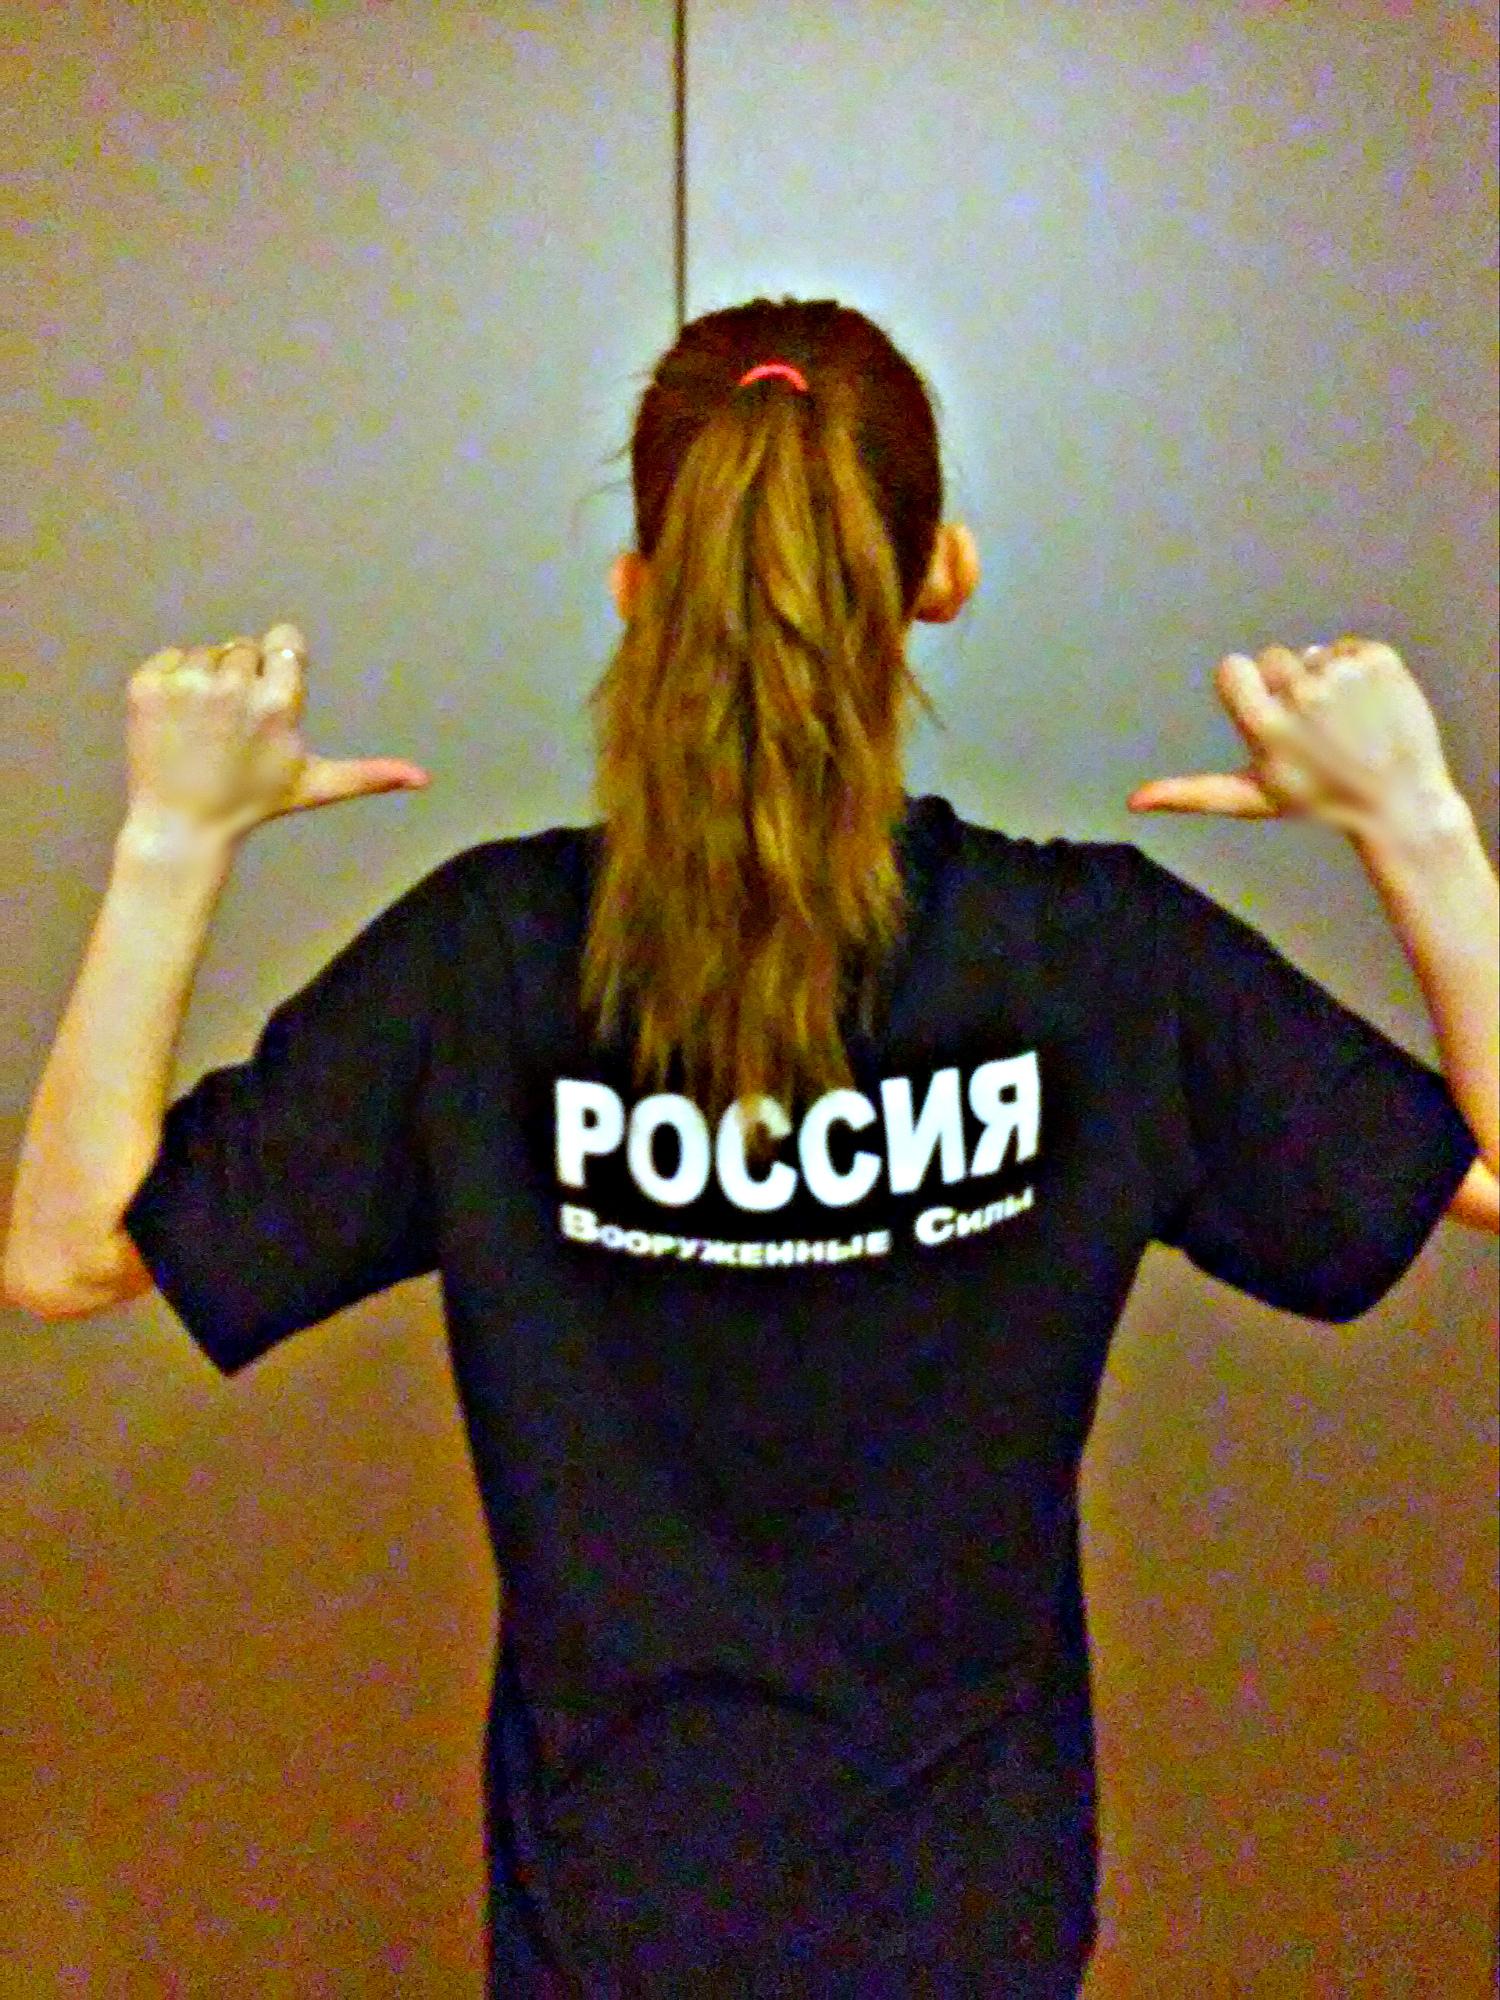 http://s2.uploads.ru/deBC5.jpg